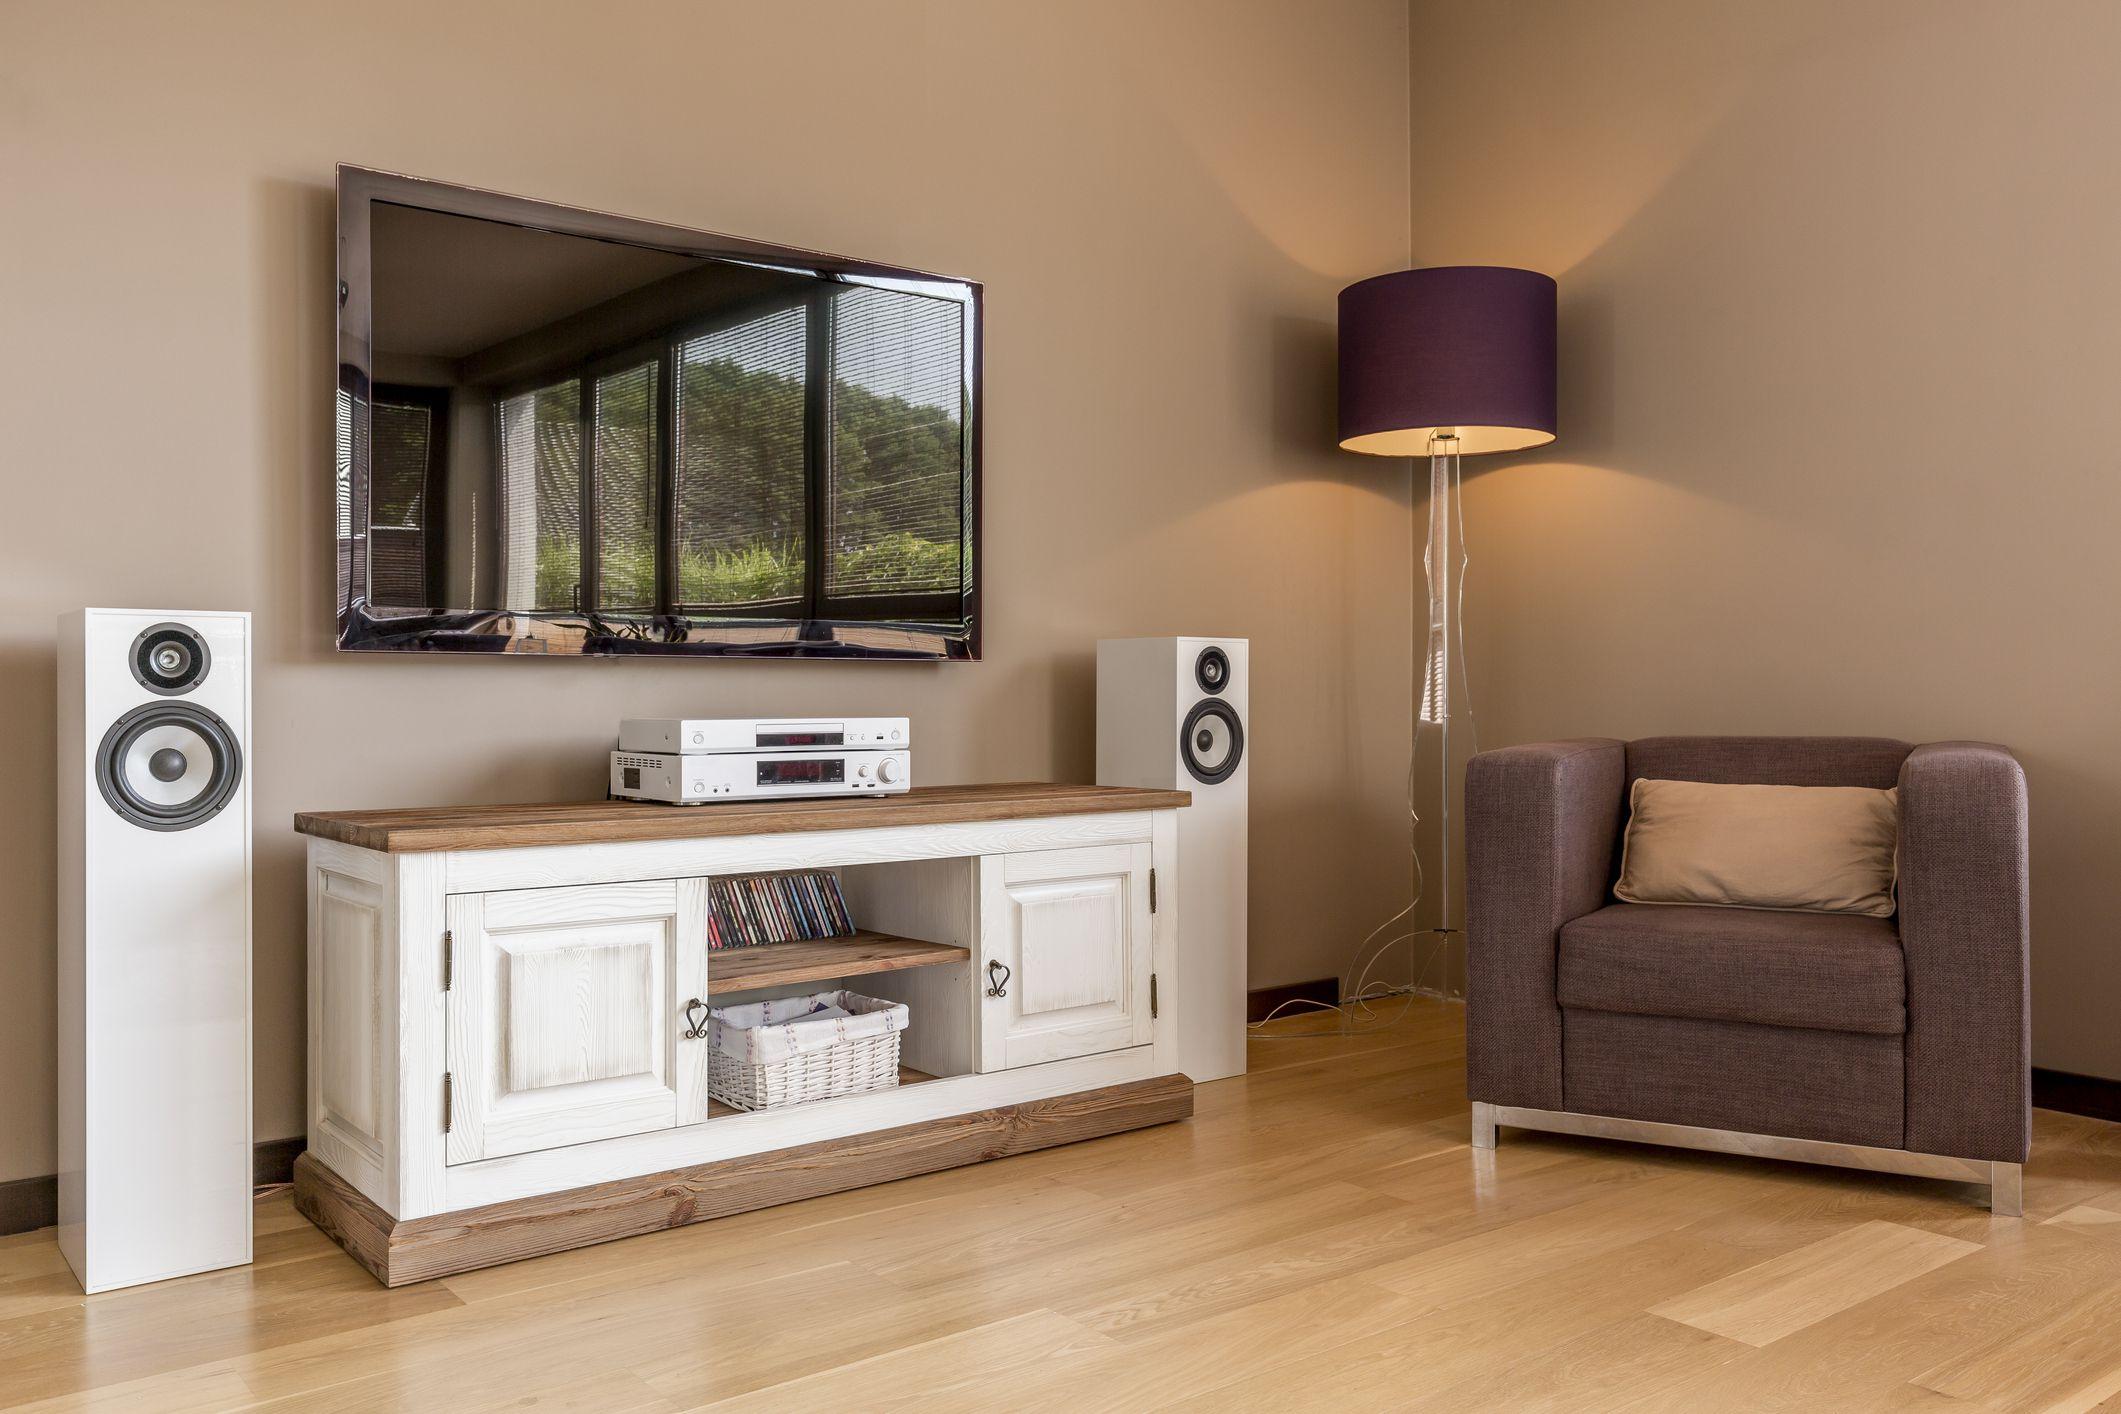 samsung curved tv kaufen trendy samsung qeqfam series smart qled certified ultra hd premium k. Black Bedroom Furniture Sets. Home Design Ideas